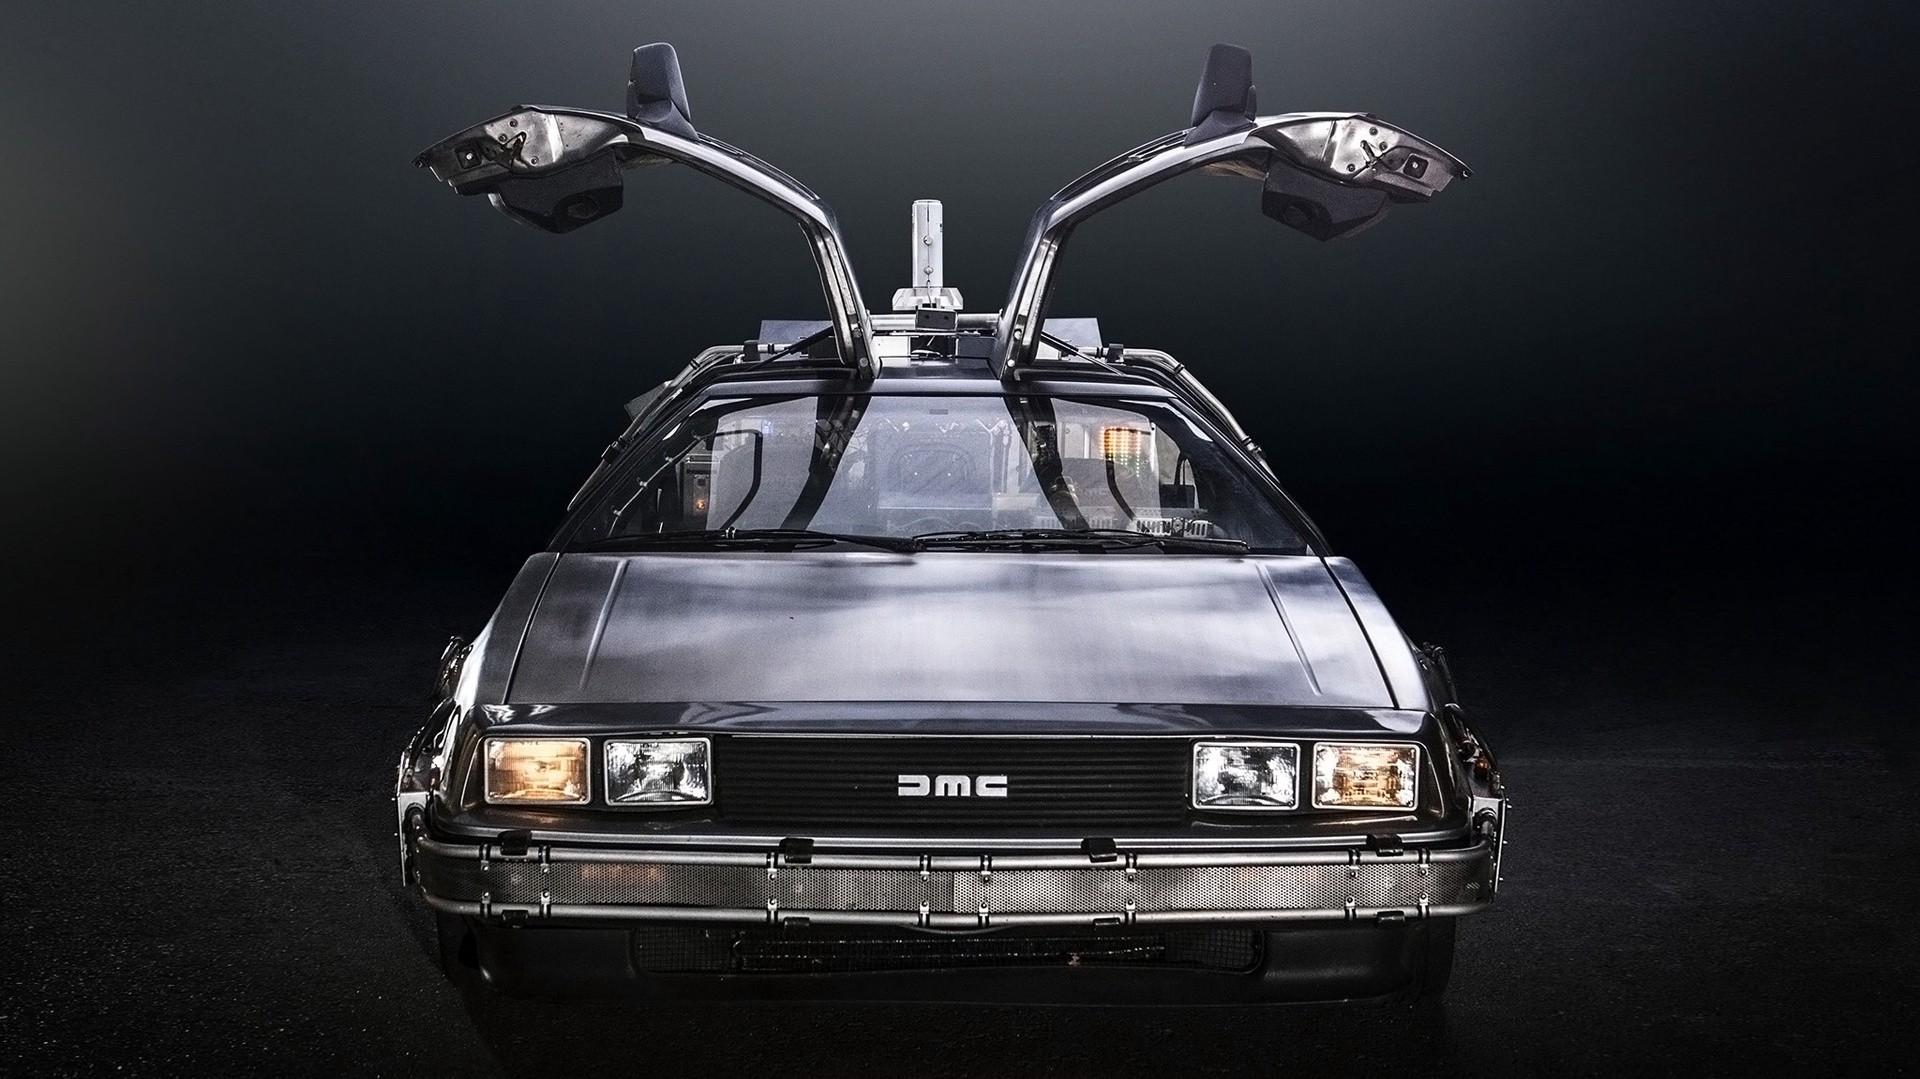 supercars delorean back to the future time travel